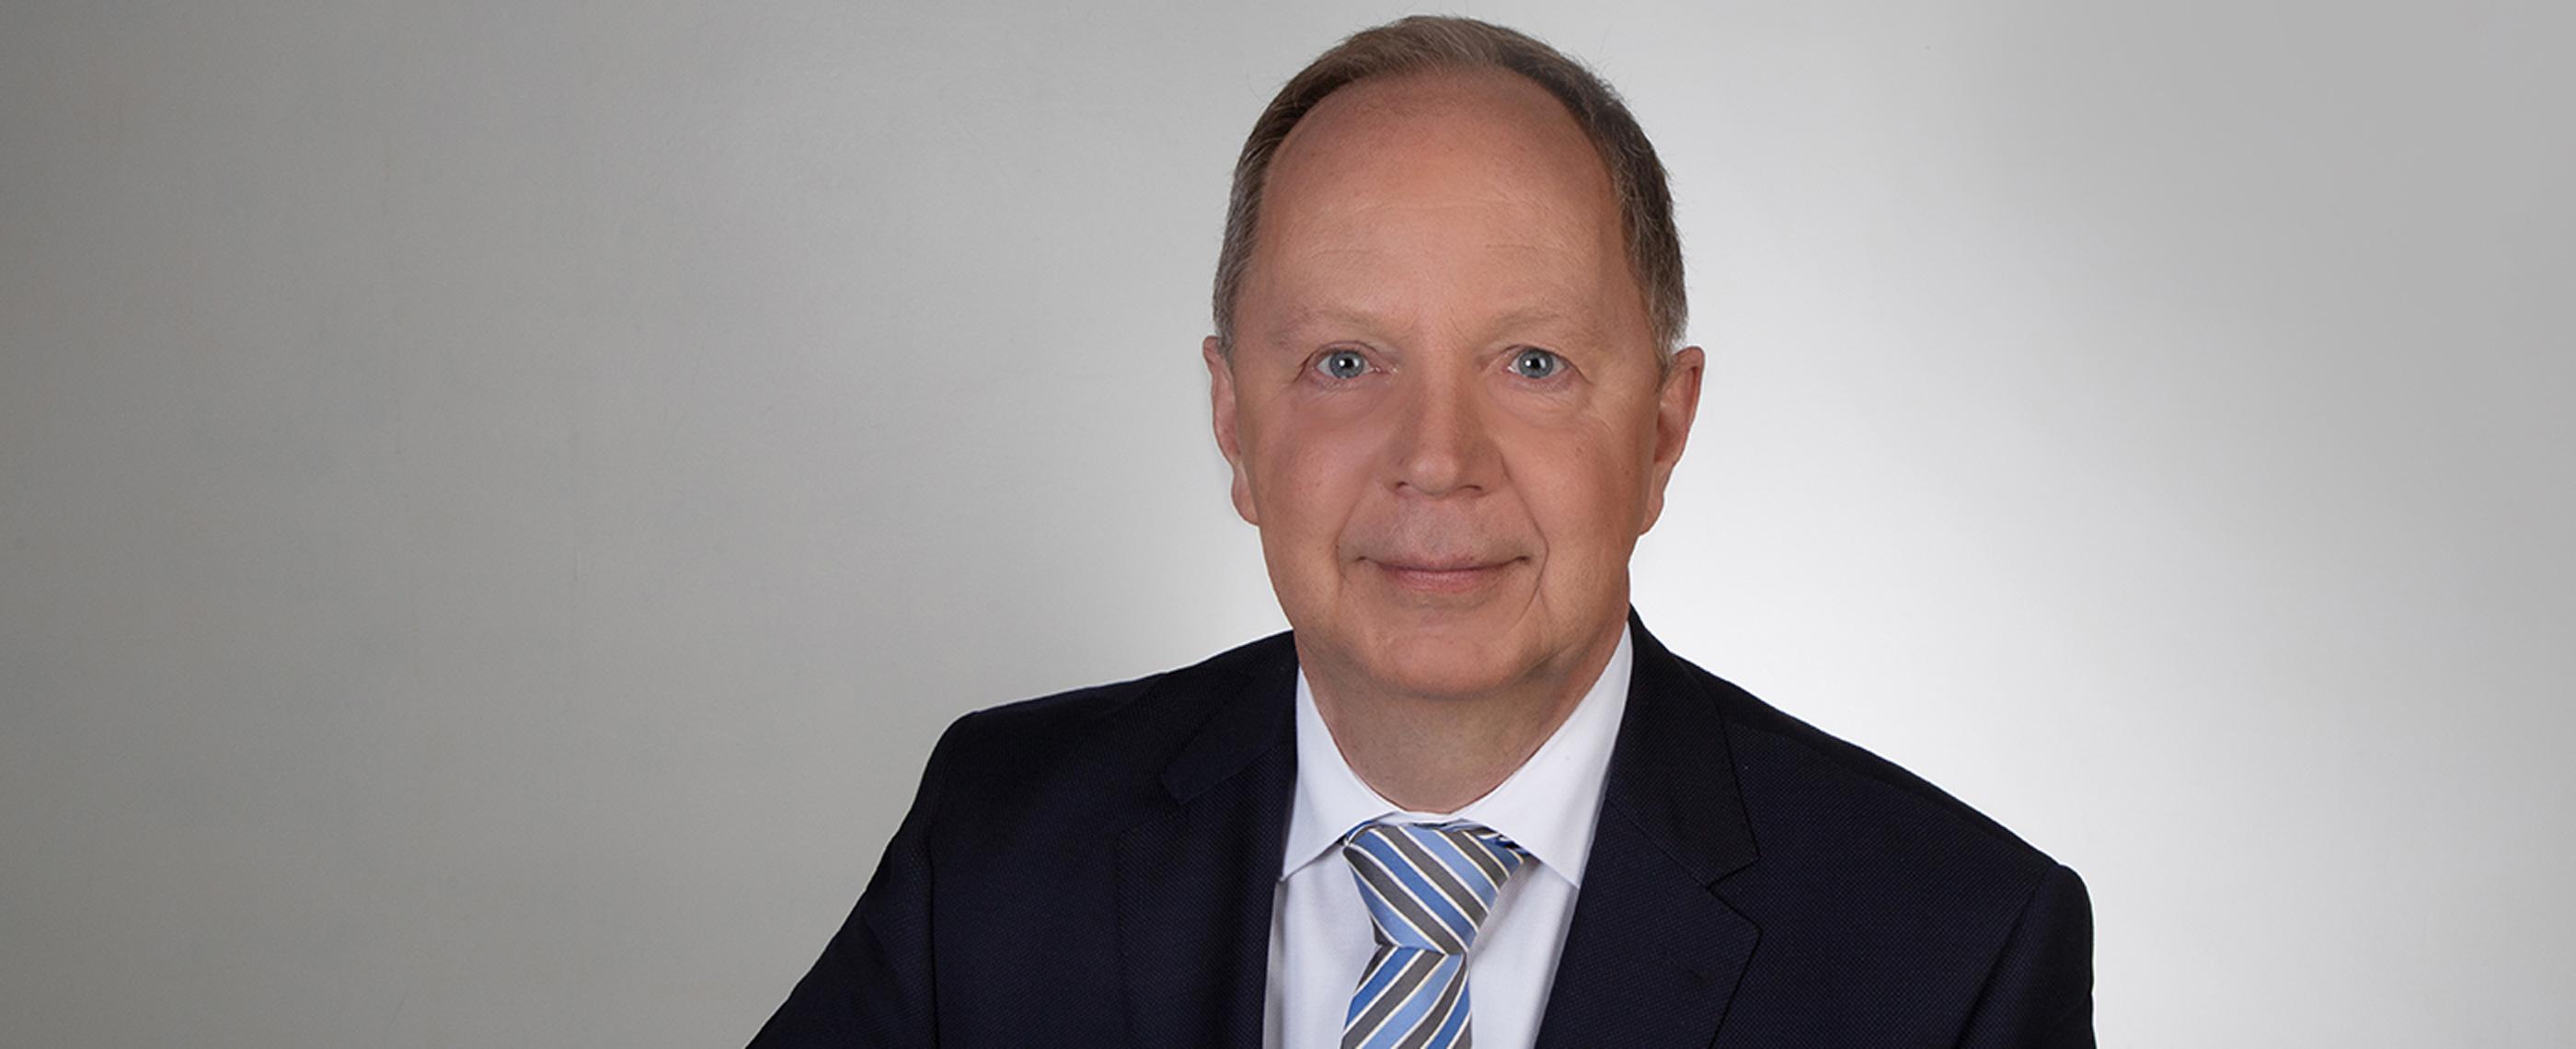 Manfred Ohrfandl